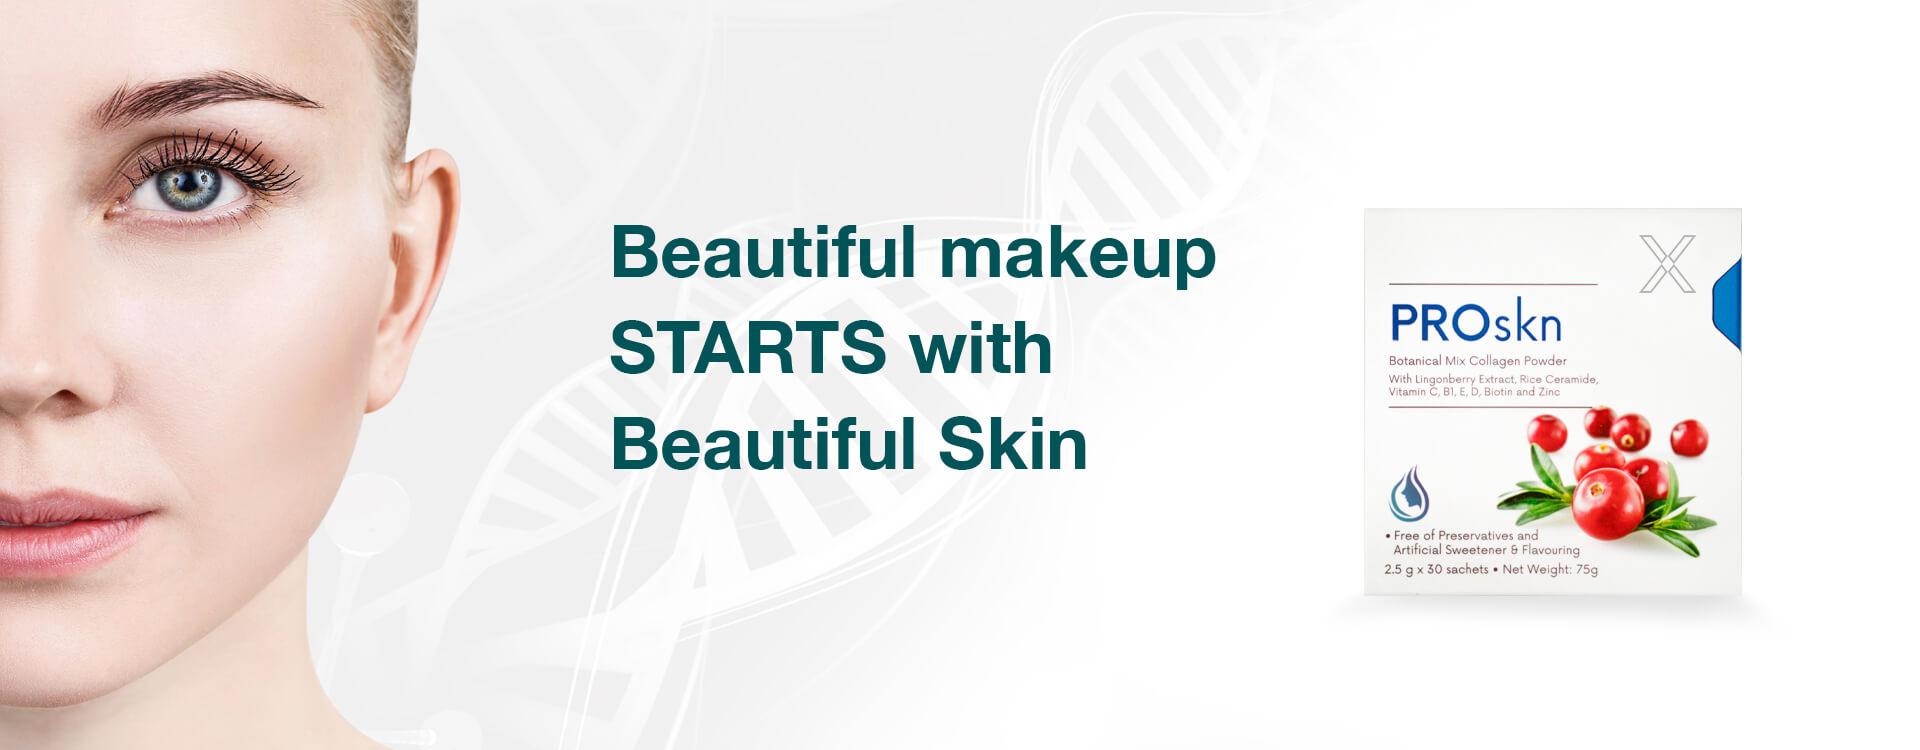 Moreth Beauty Health